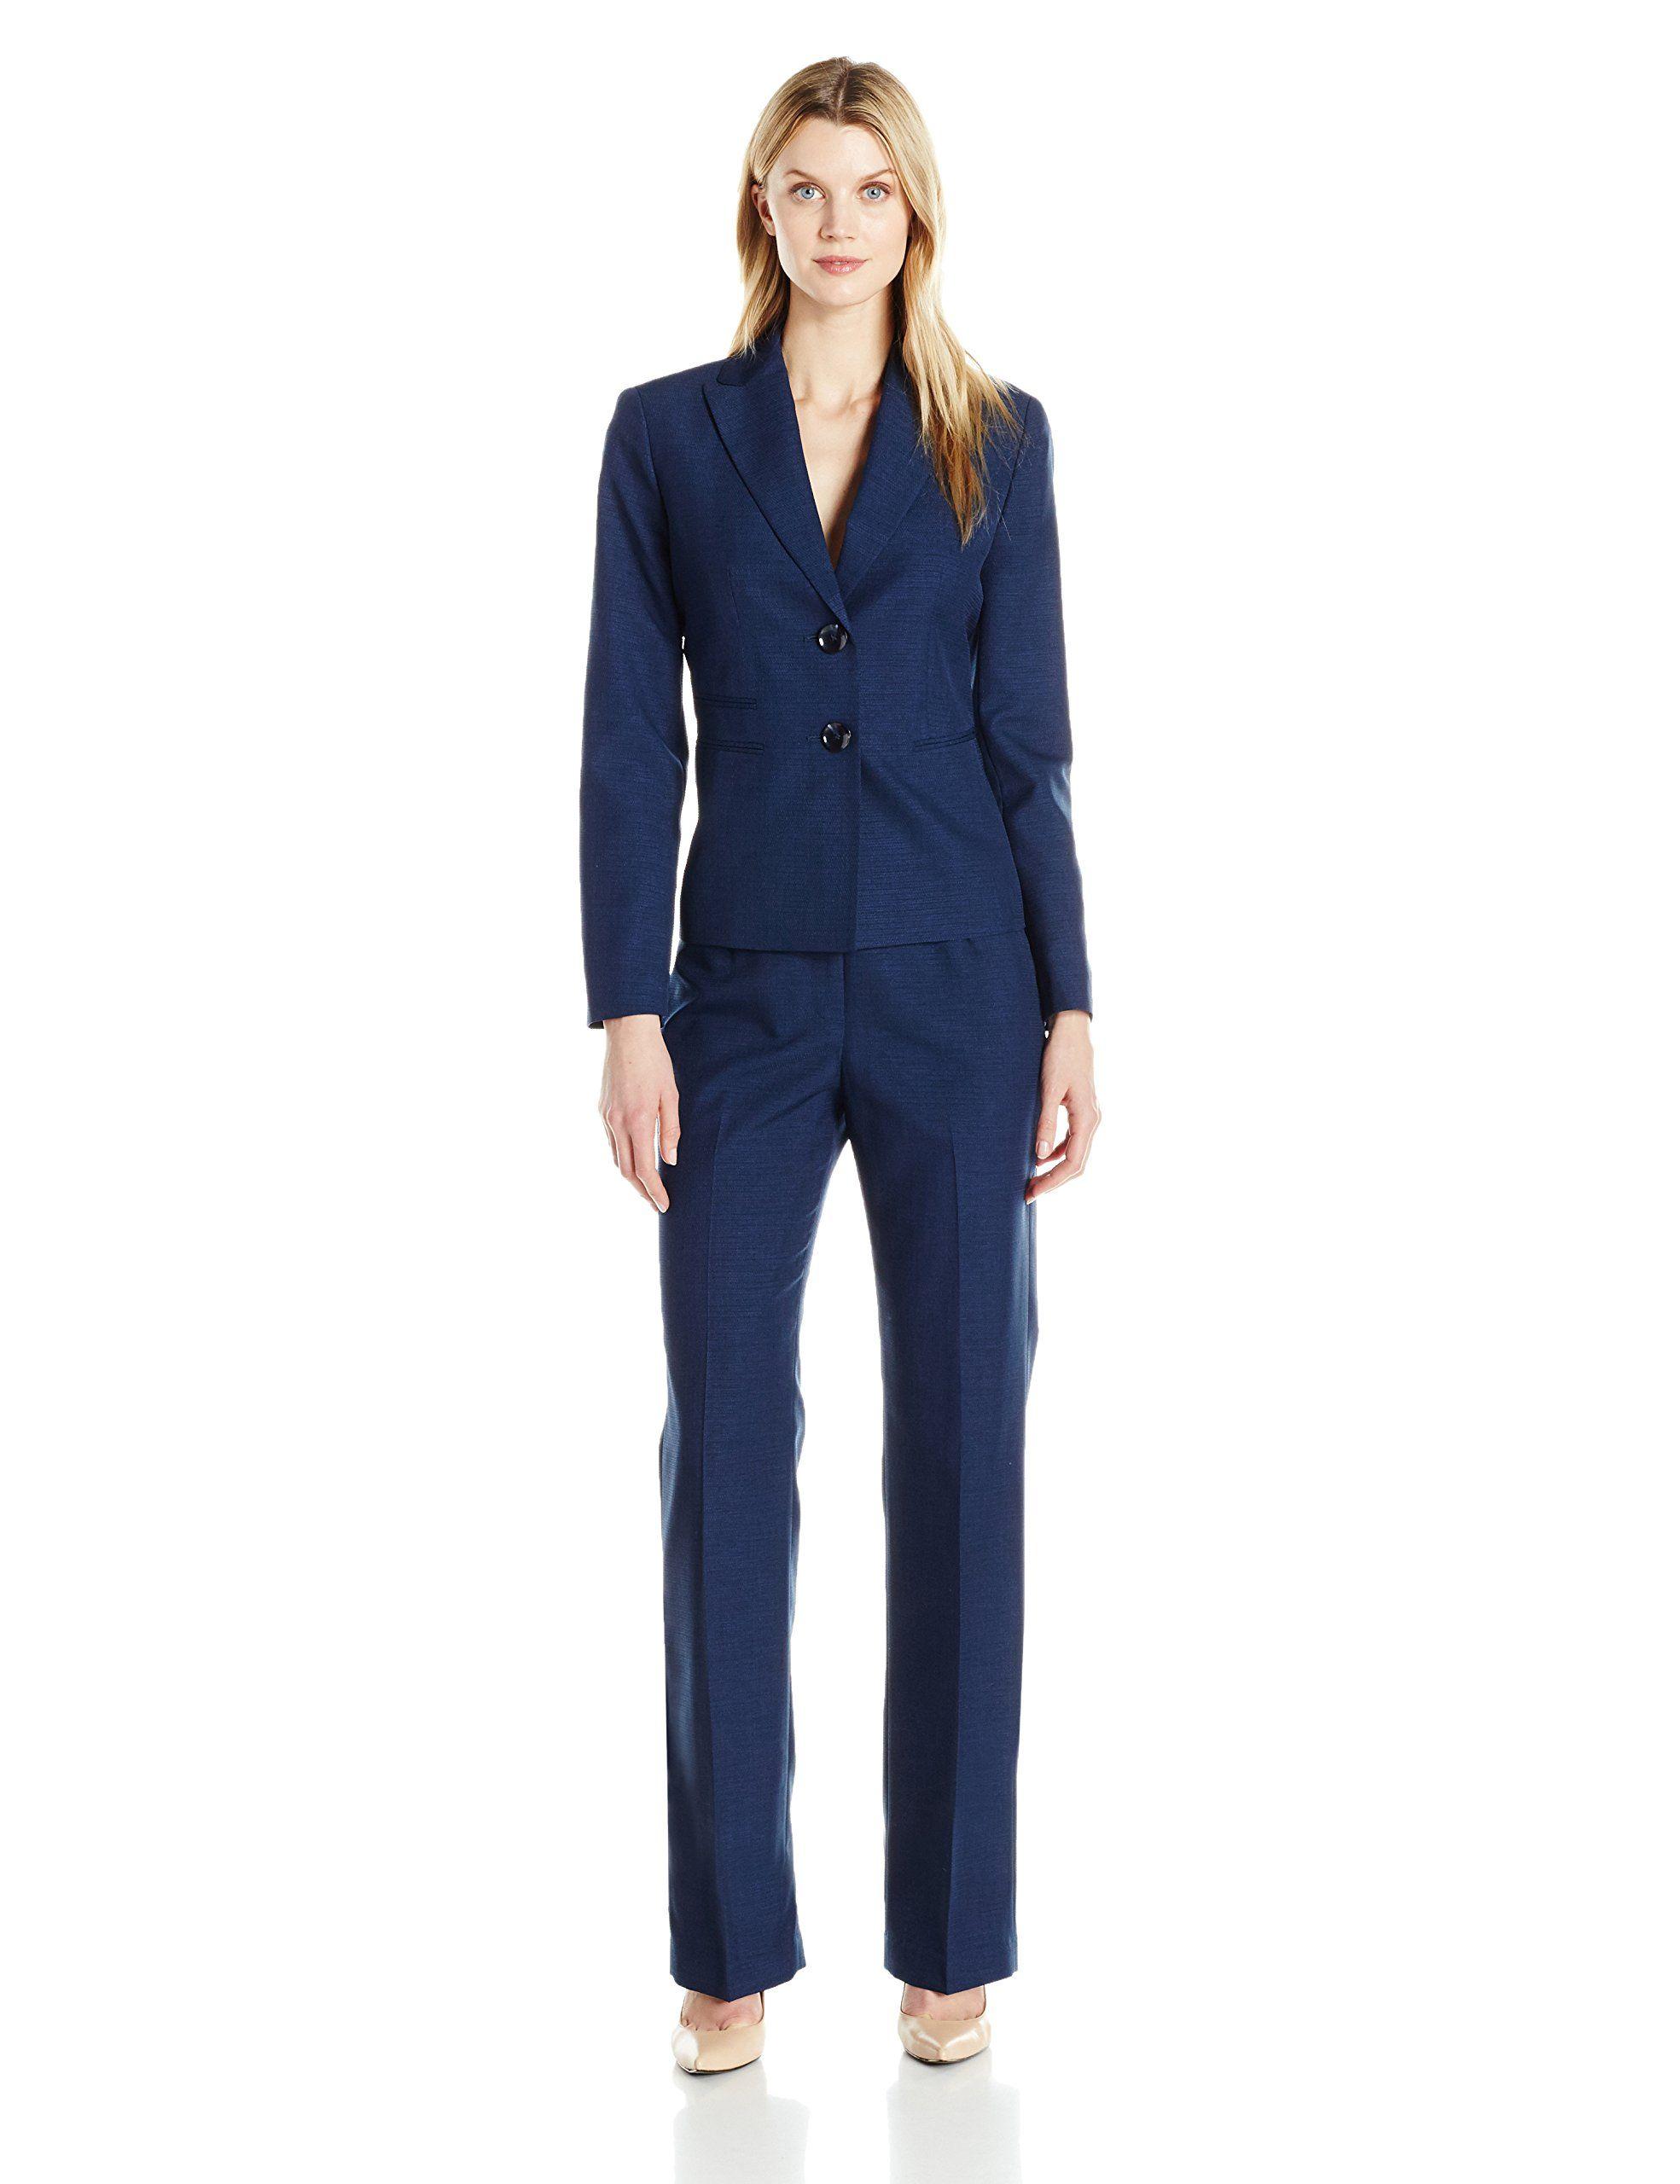 Le suit womens two button pant navy 8 suits for women